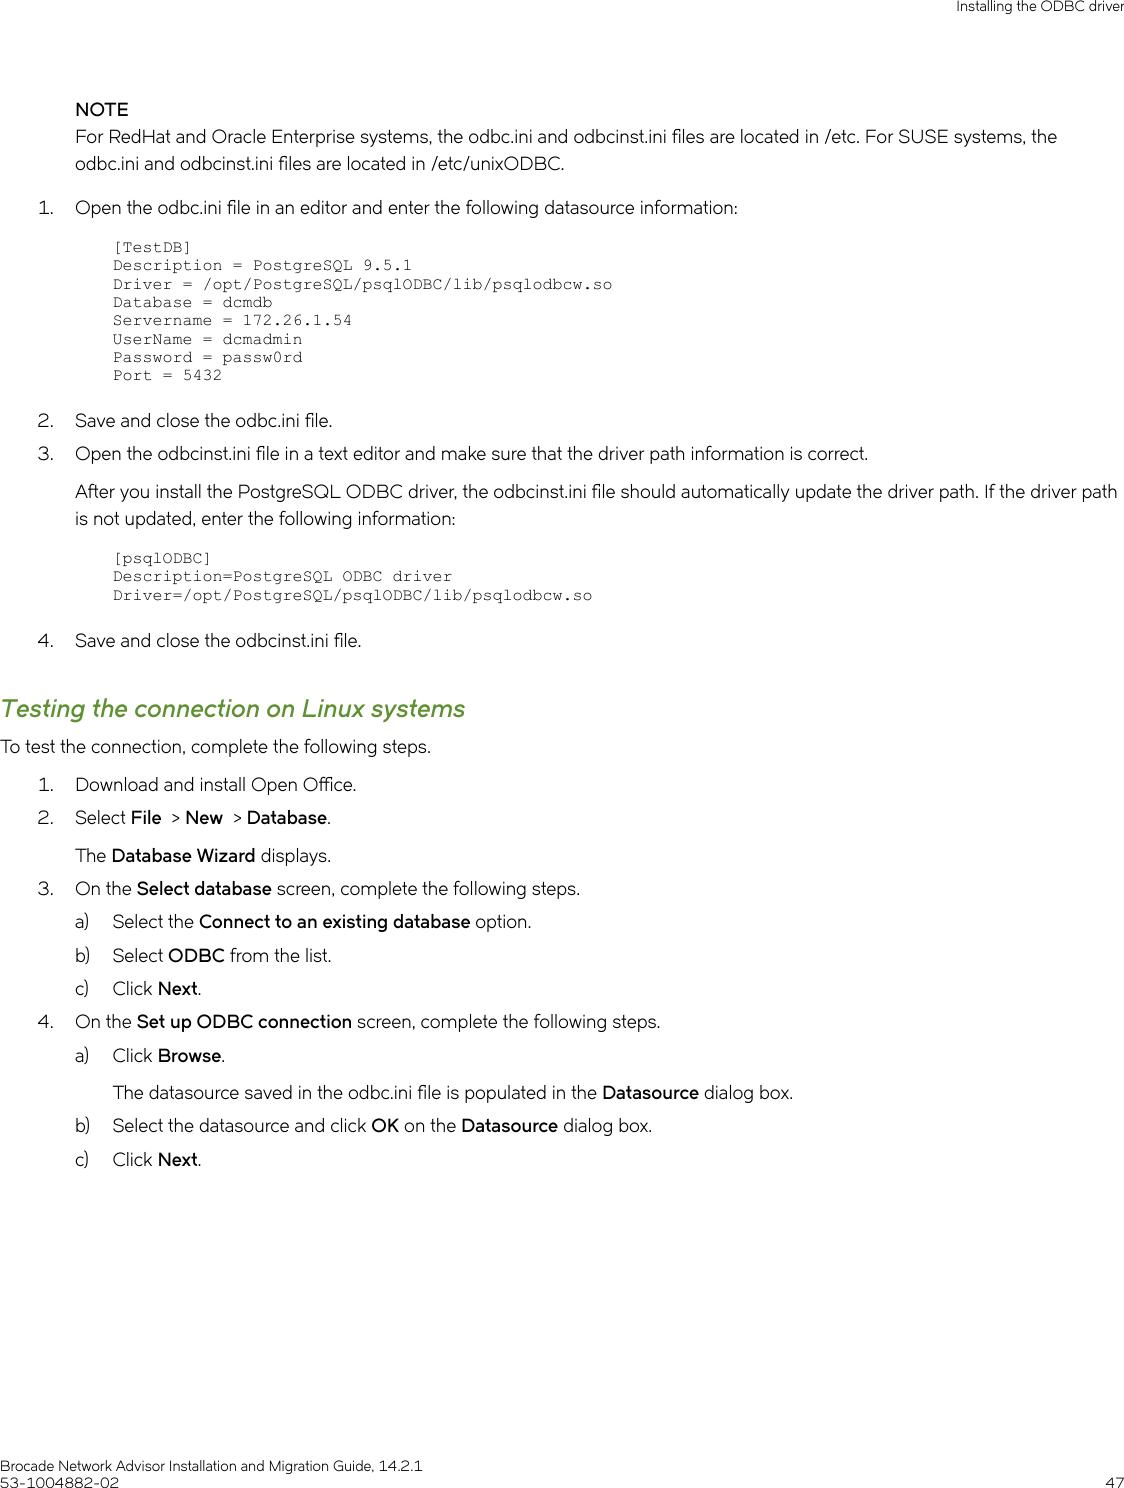 Ruckus Brocade Network Advisor Installation And Migration Guide